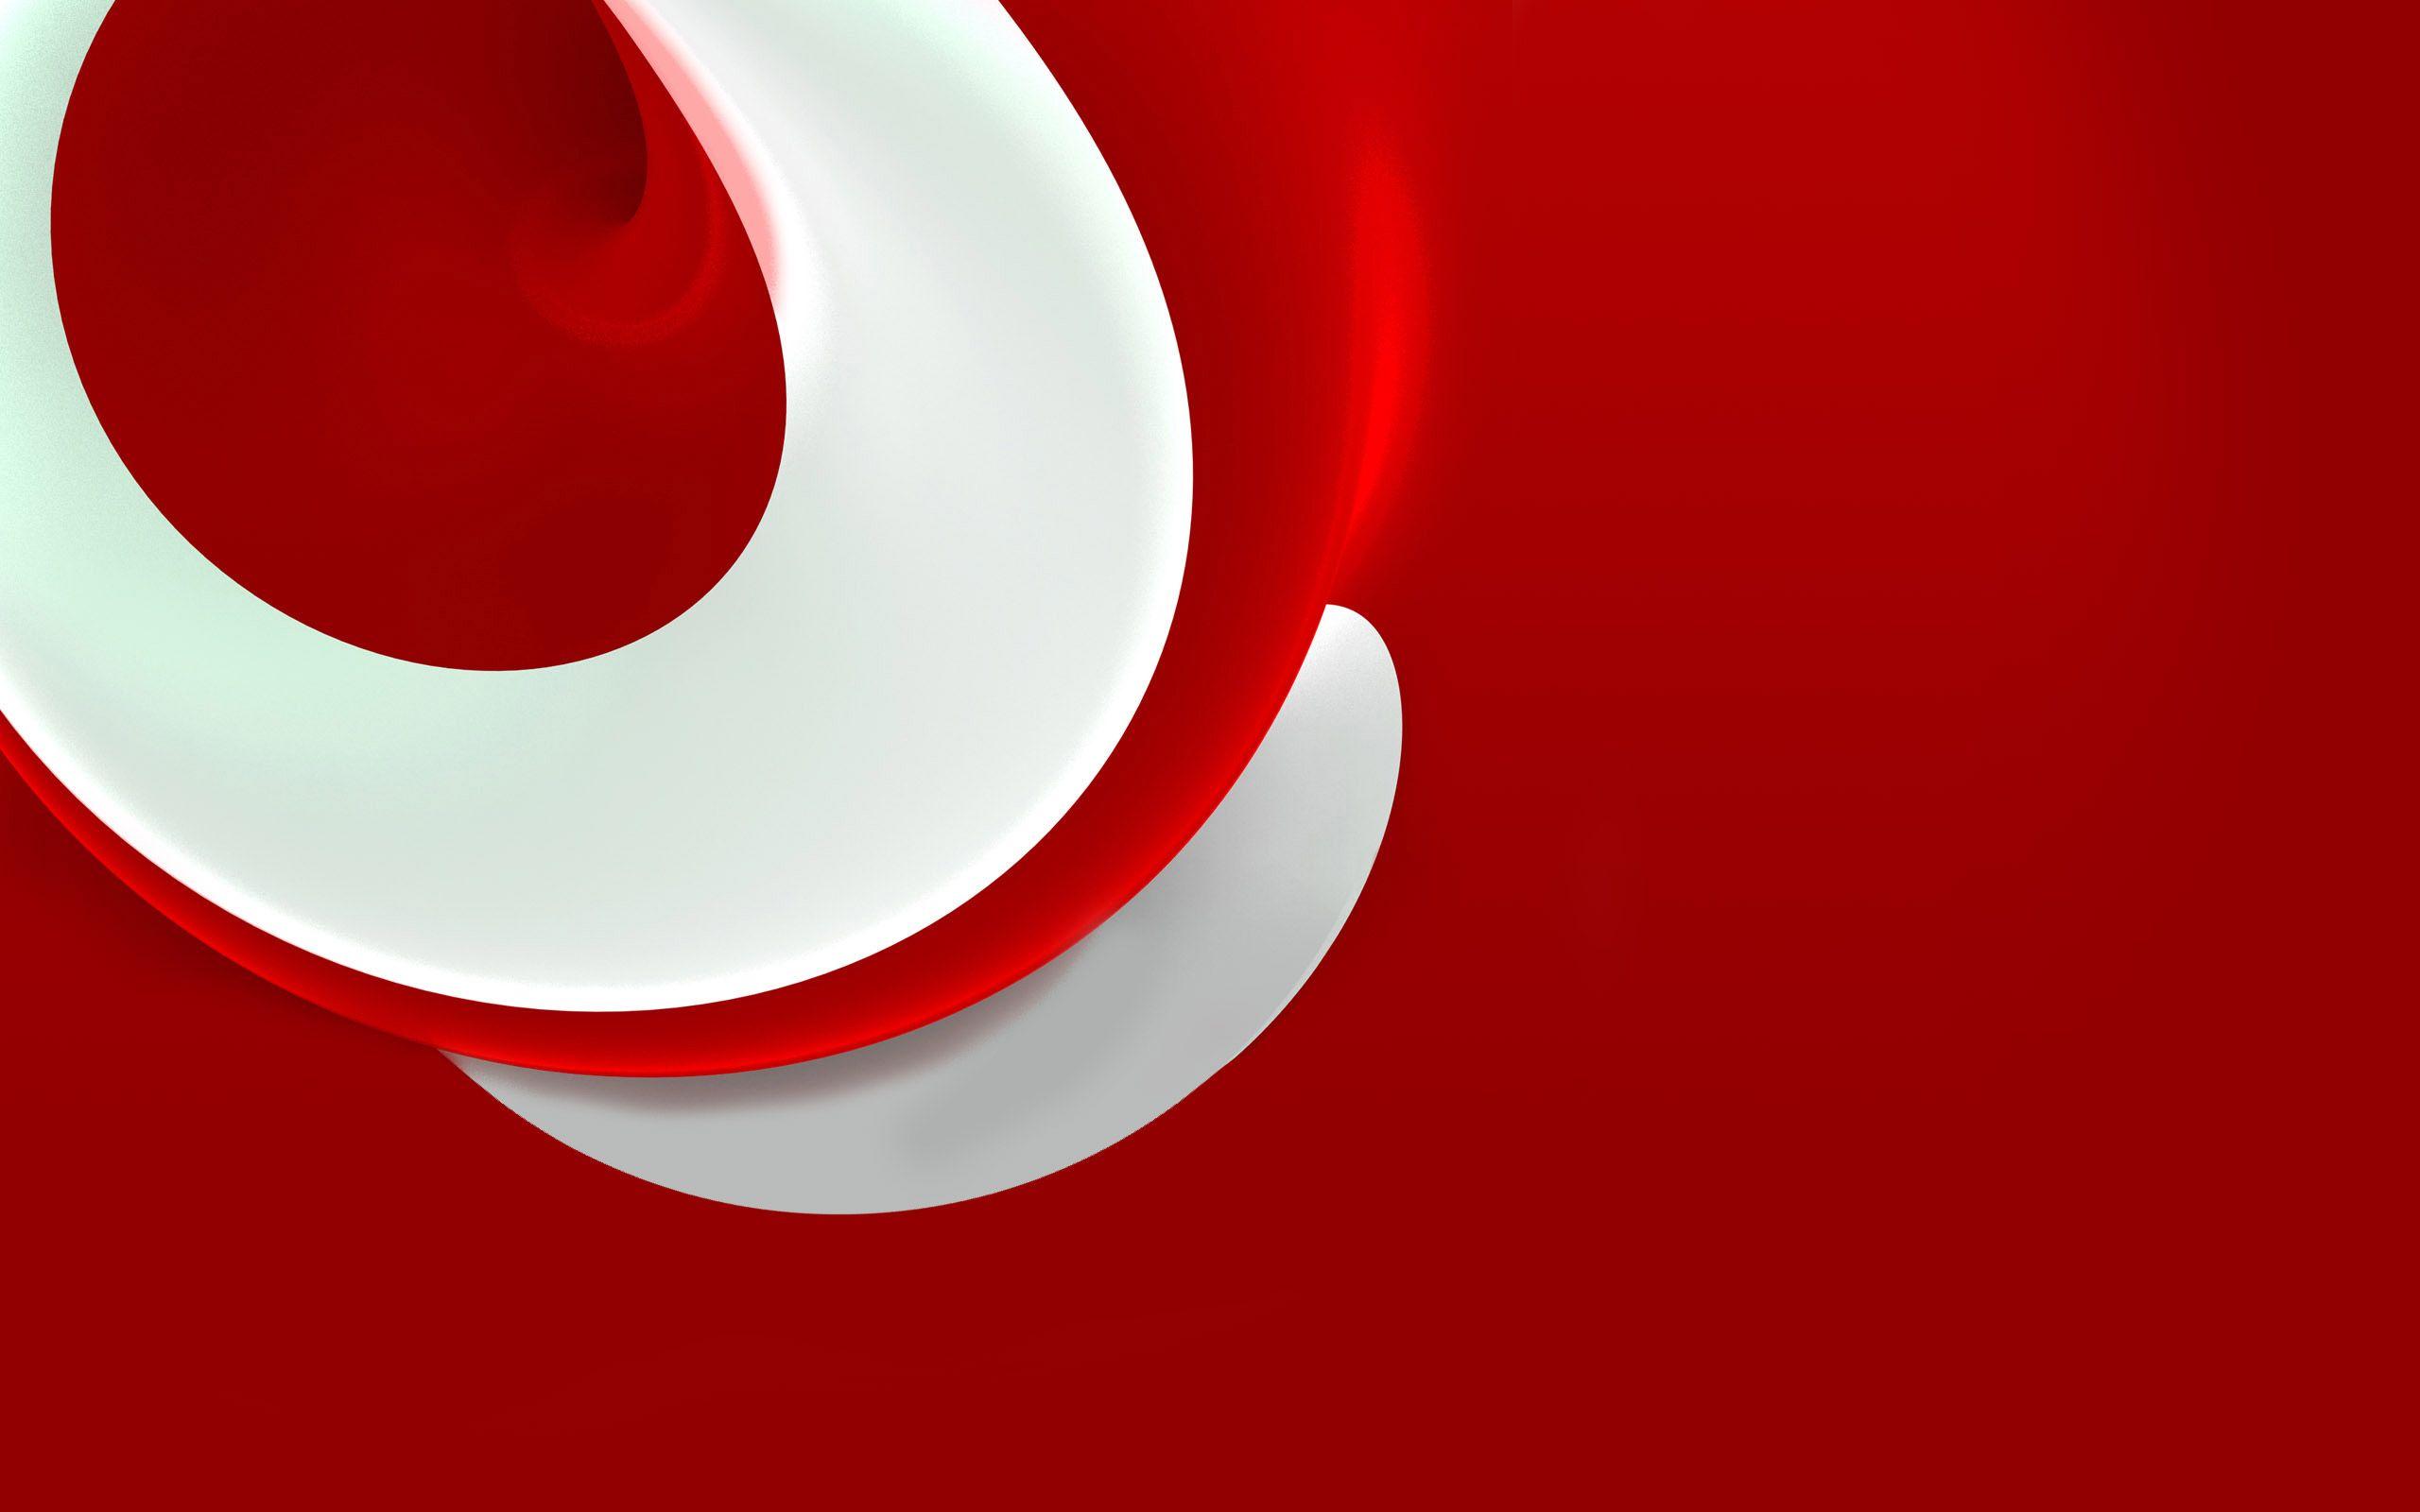 Wallpaper Background Merah Putih Abstrak Bulat